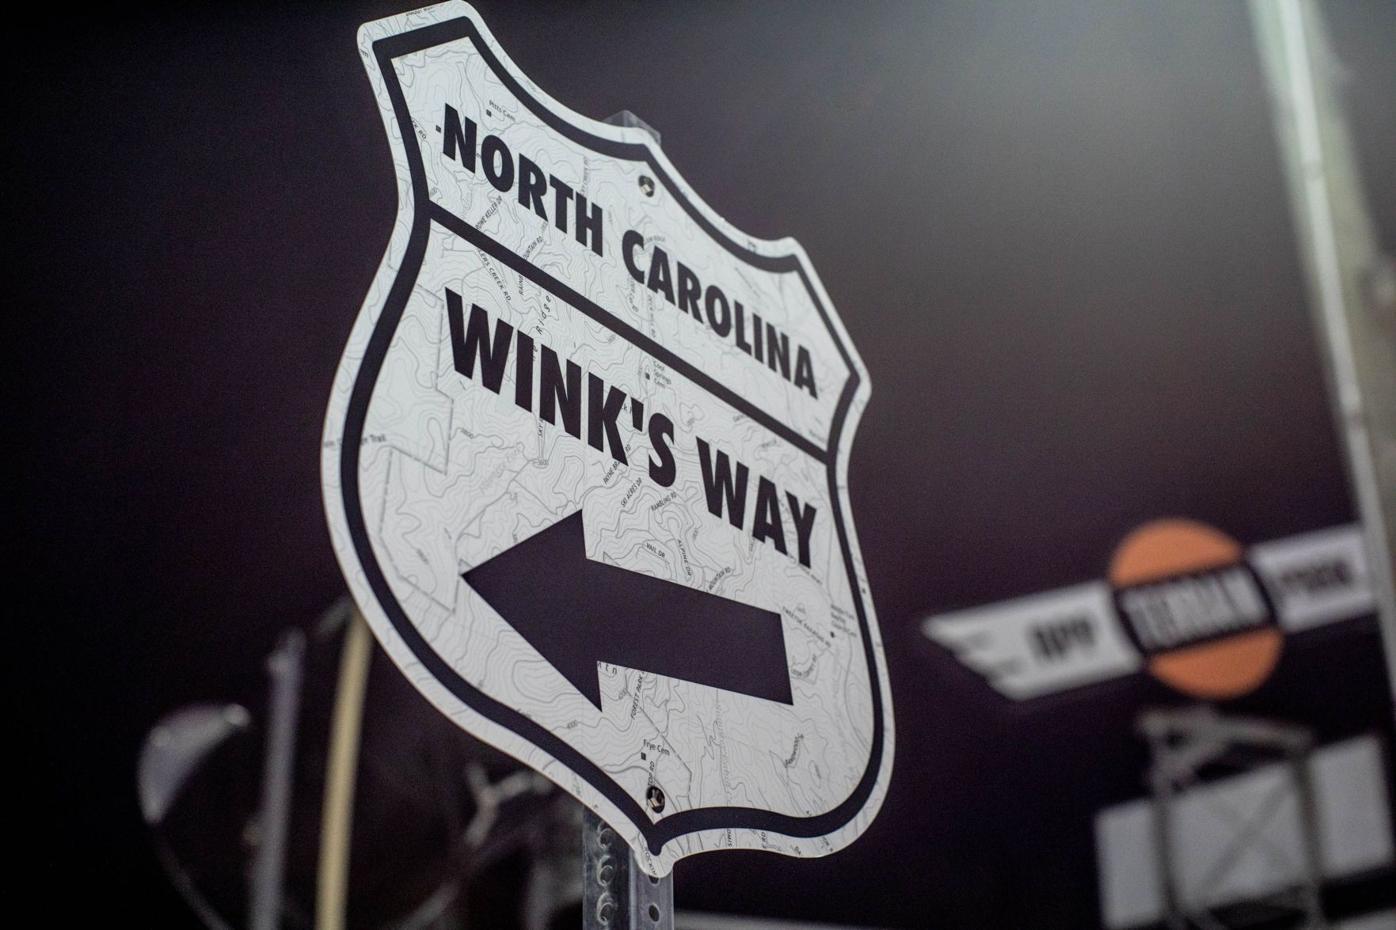 Wink's Way